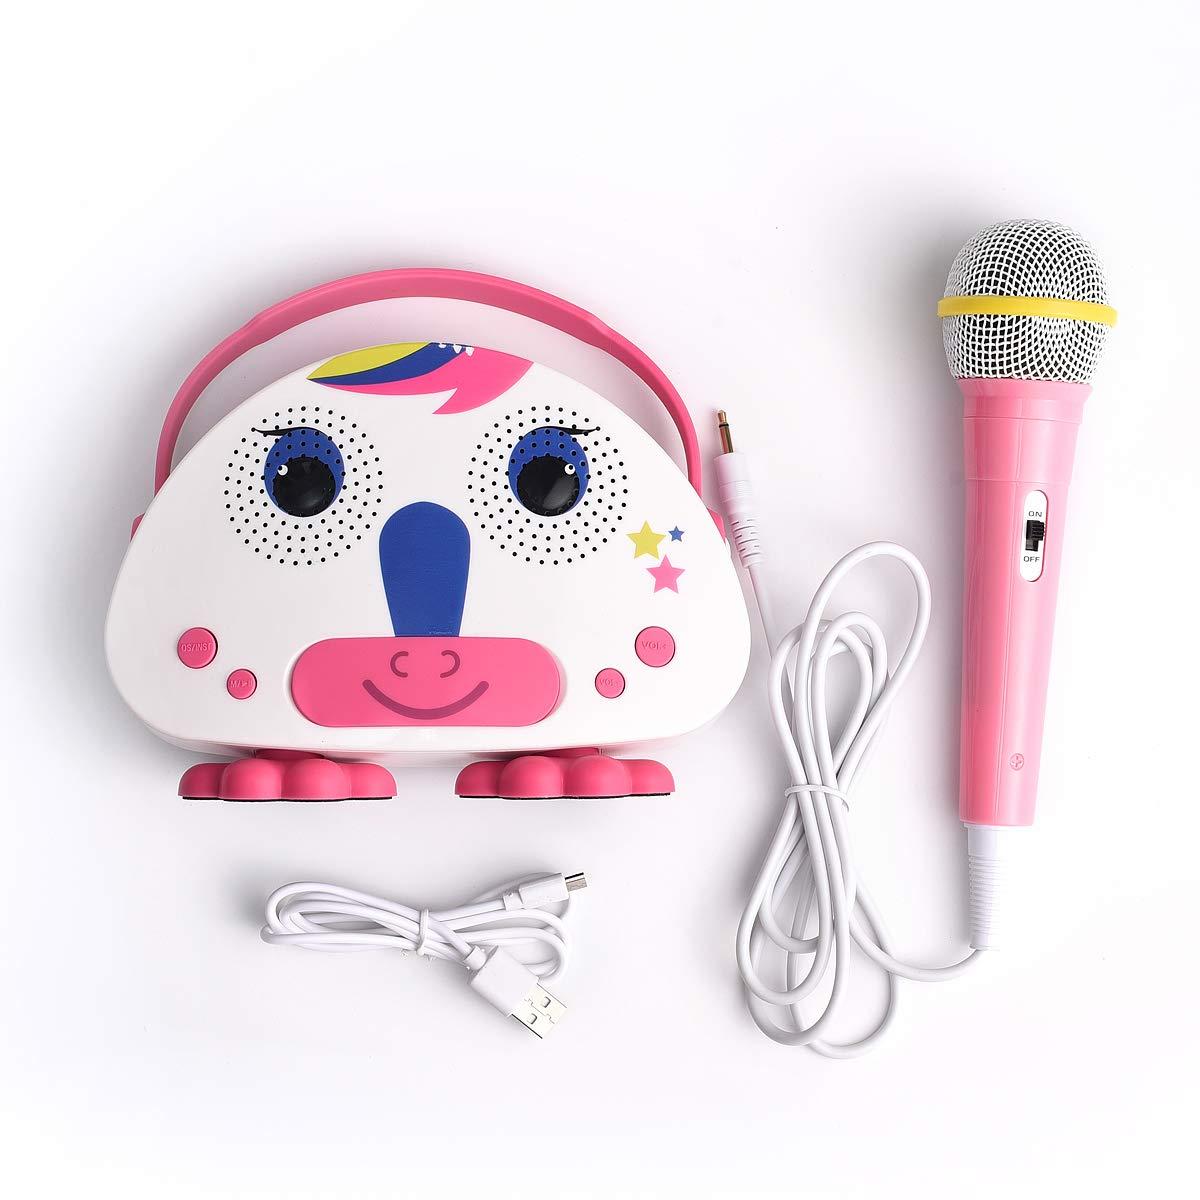 HowQ Outdoor Toys Karaoke Machine , Portable Kids Karaoke Bluetooth Speaker Wireless Cartoon Speaker for Kids for Indoor Toys Travel Activities with Microphone Karaoke Machine(Pink-White) by HowQ (Image #3)